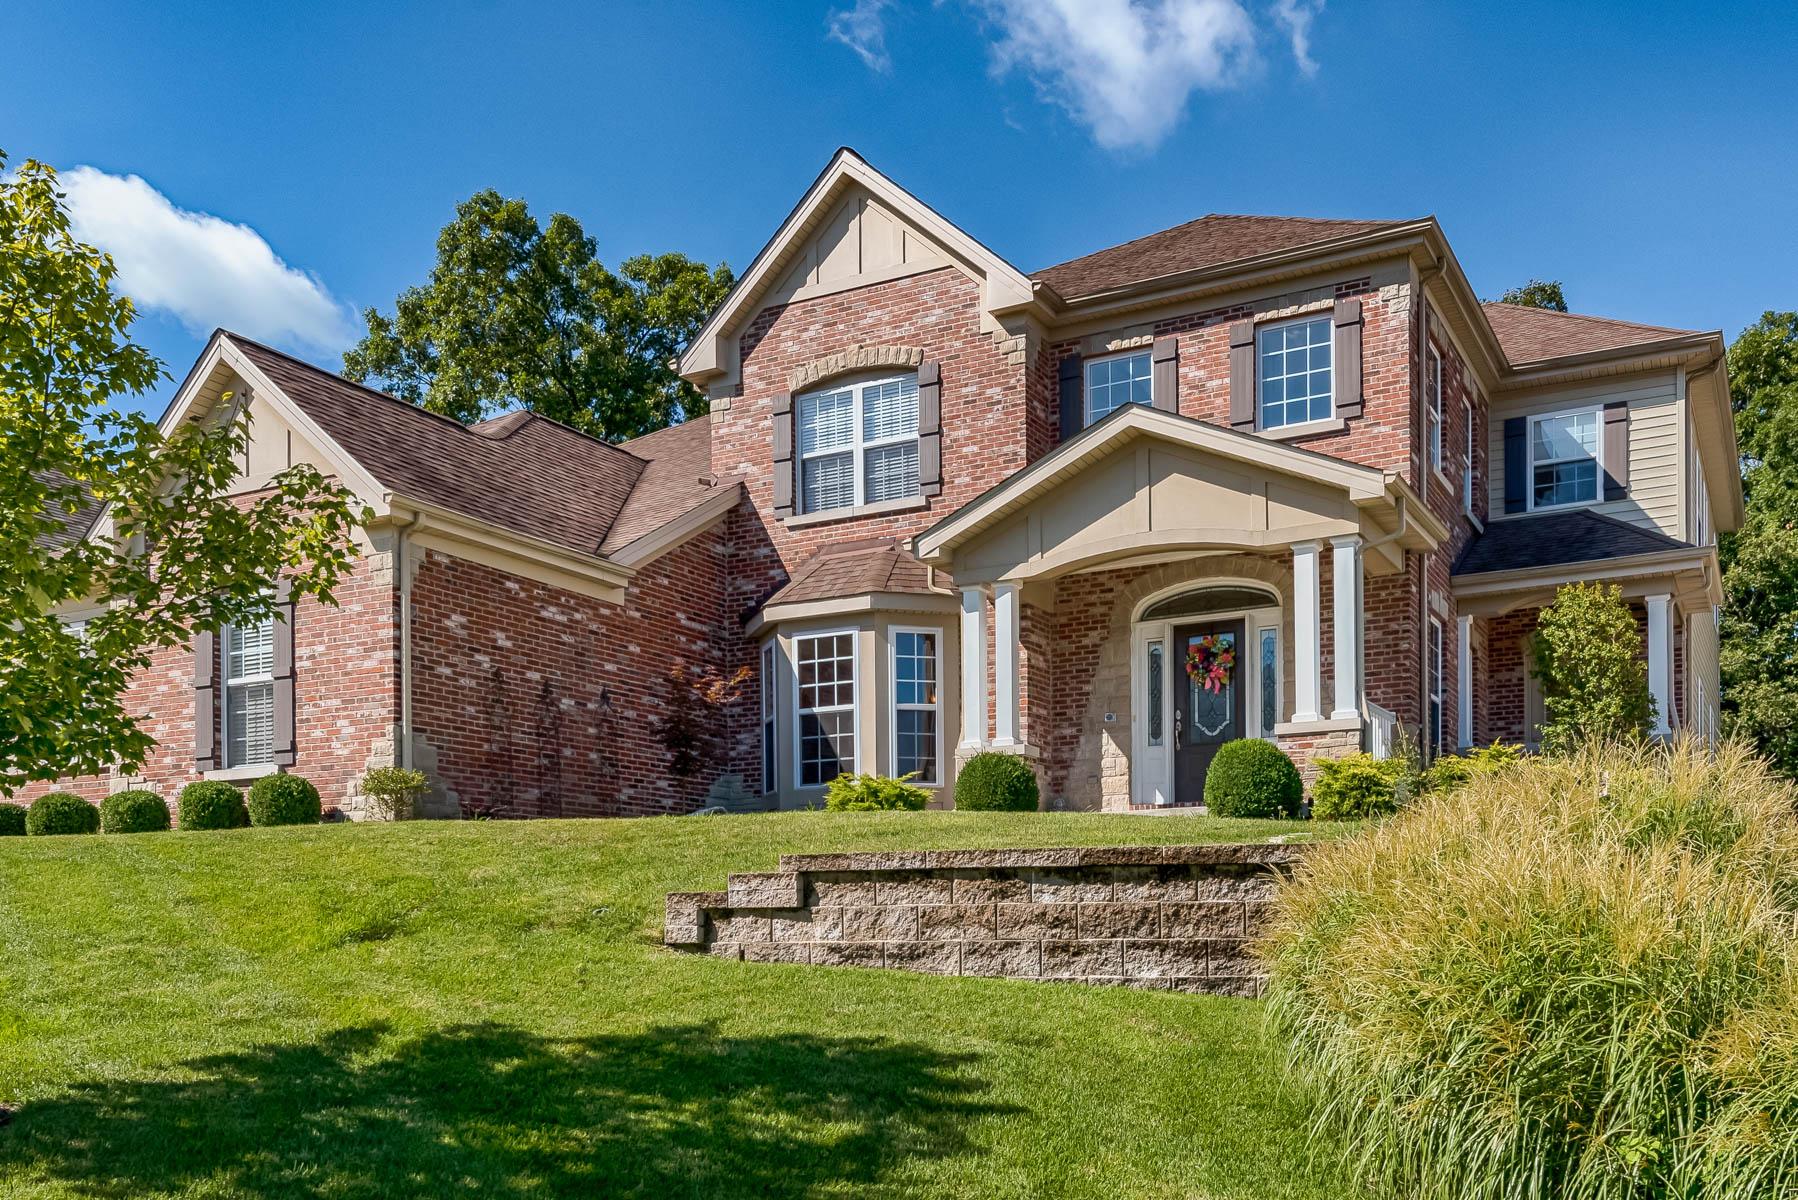 Casa para uma família para Venda às Woodcliff Heights 531 Woodcliff Heights Dr Wildwood, Missouri, 63011 Estados Unidos